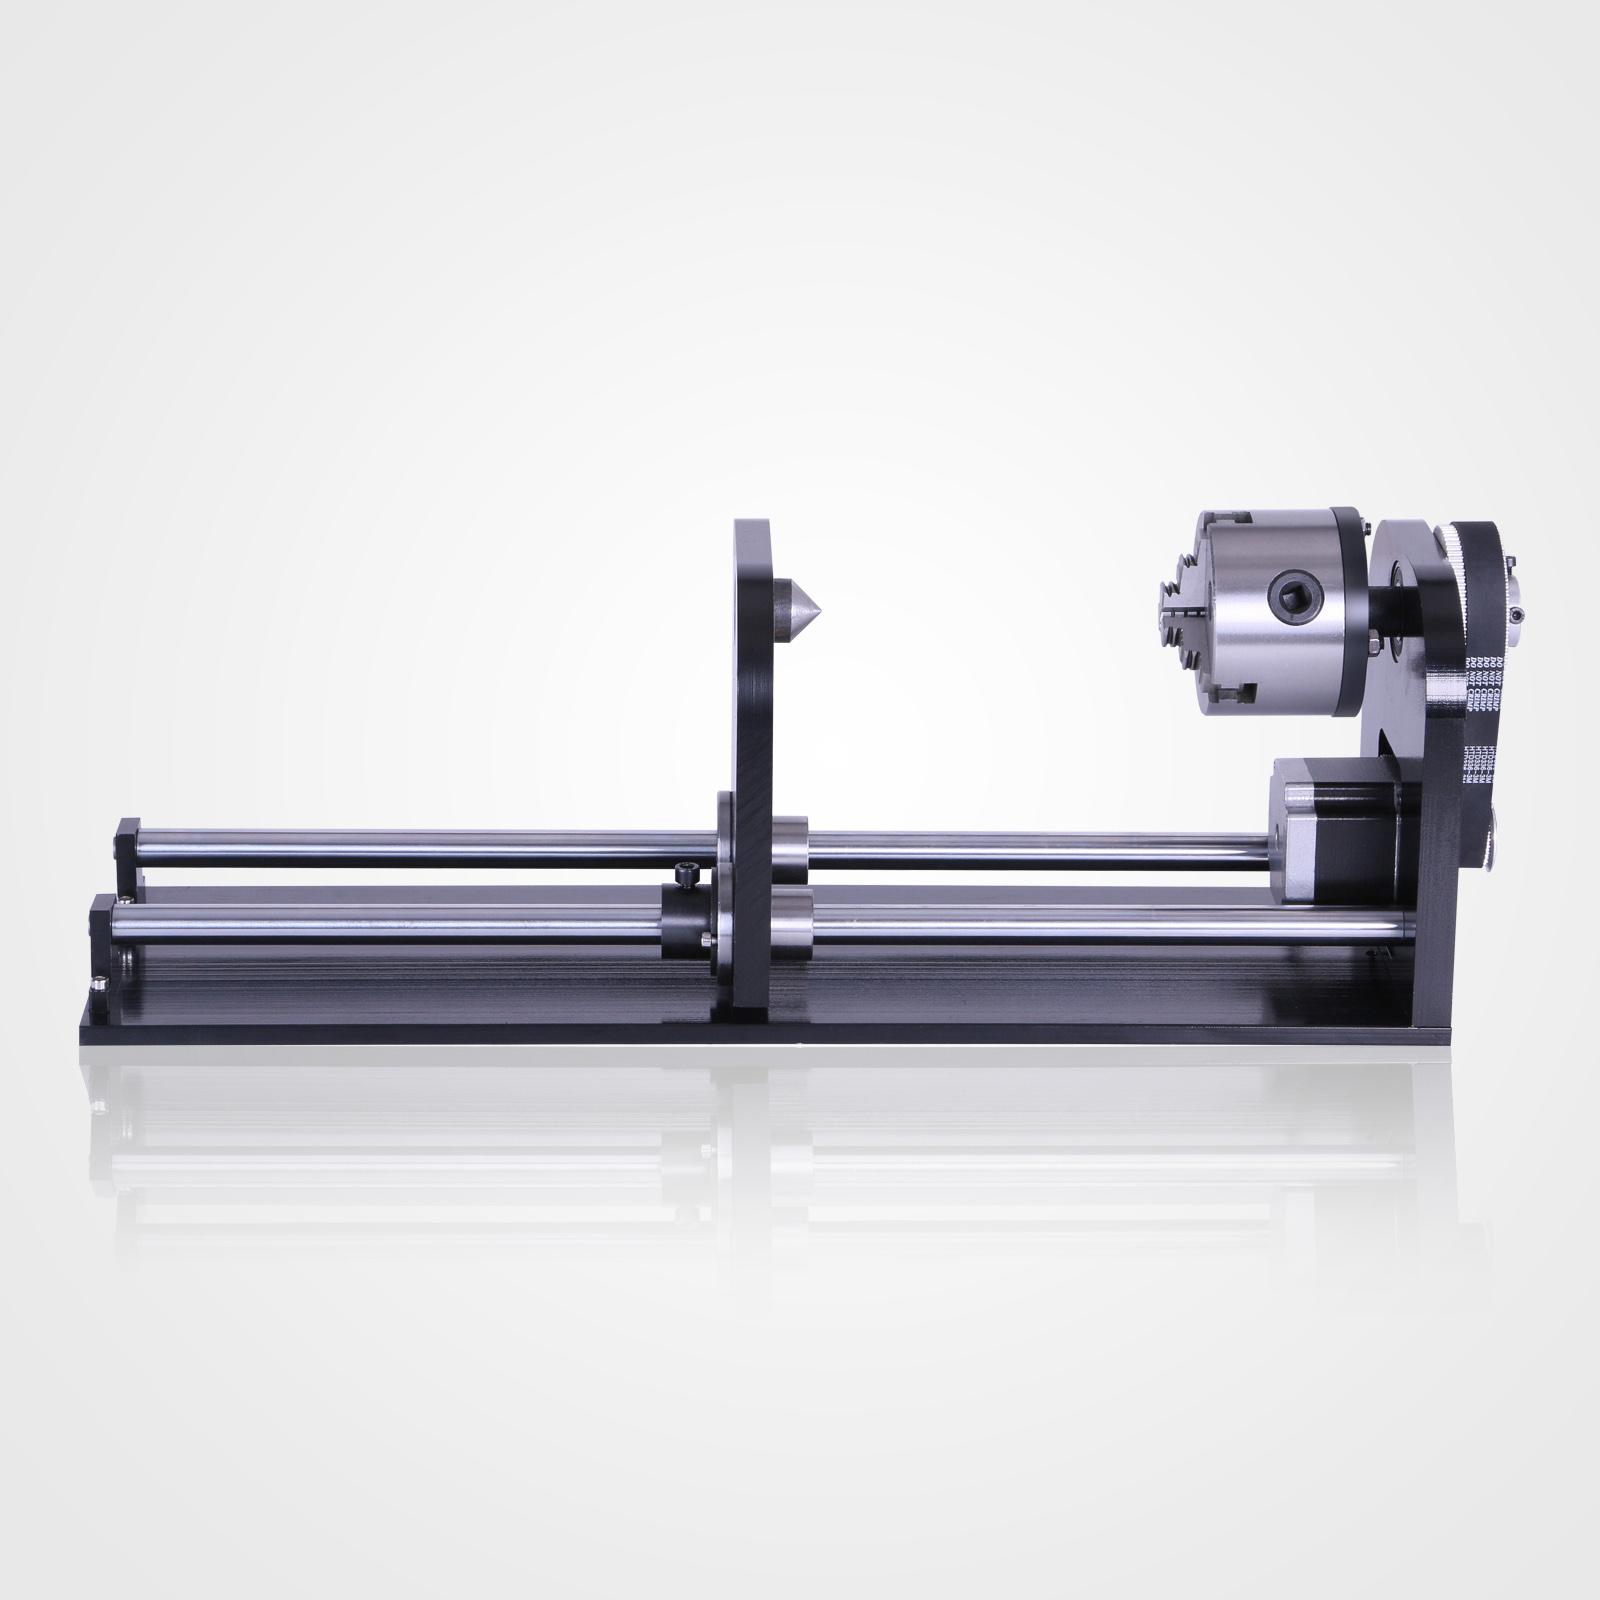 Macchina-per-Incisione-Laser-CO2-40-130W-Asse-Rotante-Tagliatrice-Incisore miniatura 83